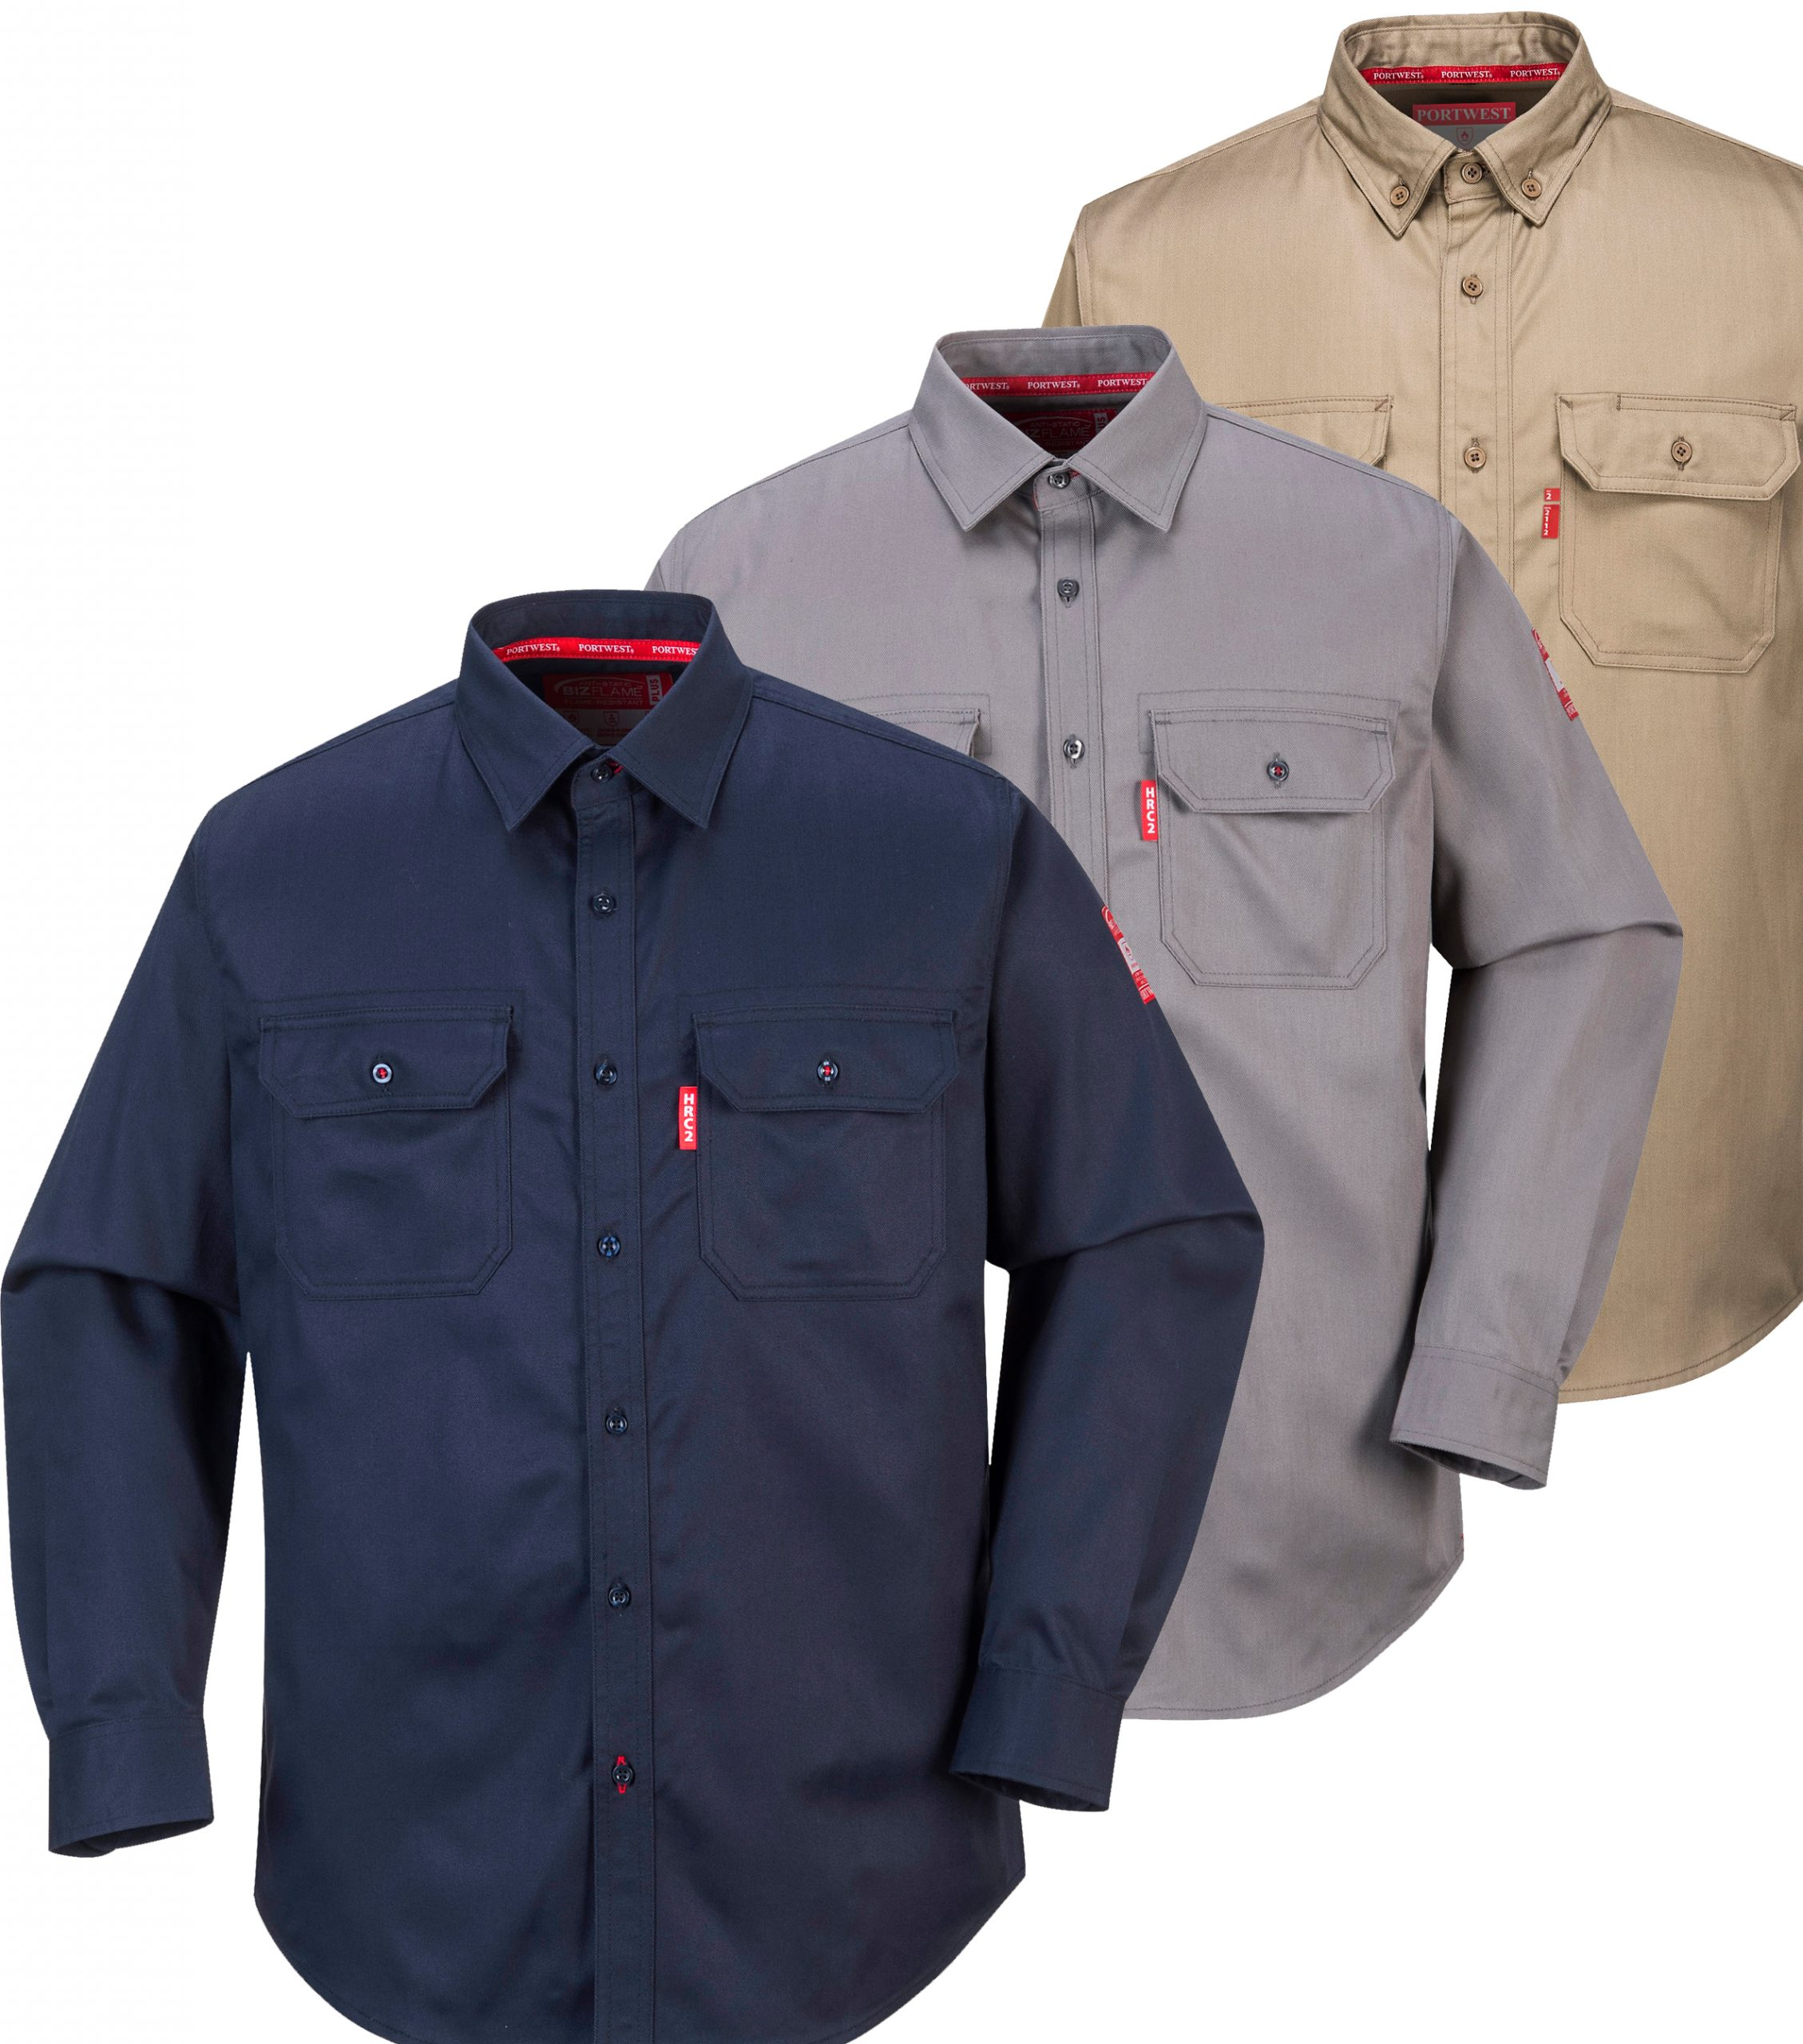 Portwest FR02 Bizflame Fire Resistant Henley Safety Long Sleeved T Shirt ASTM